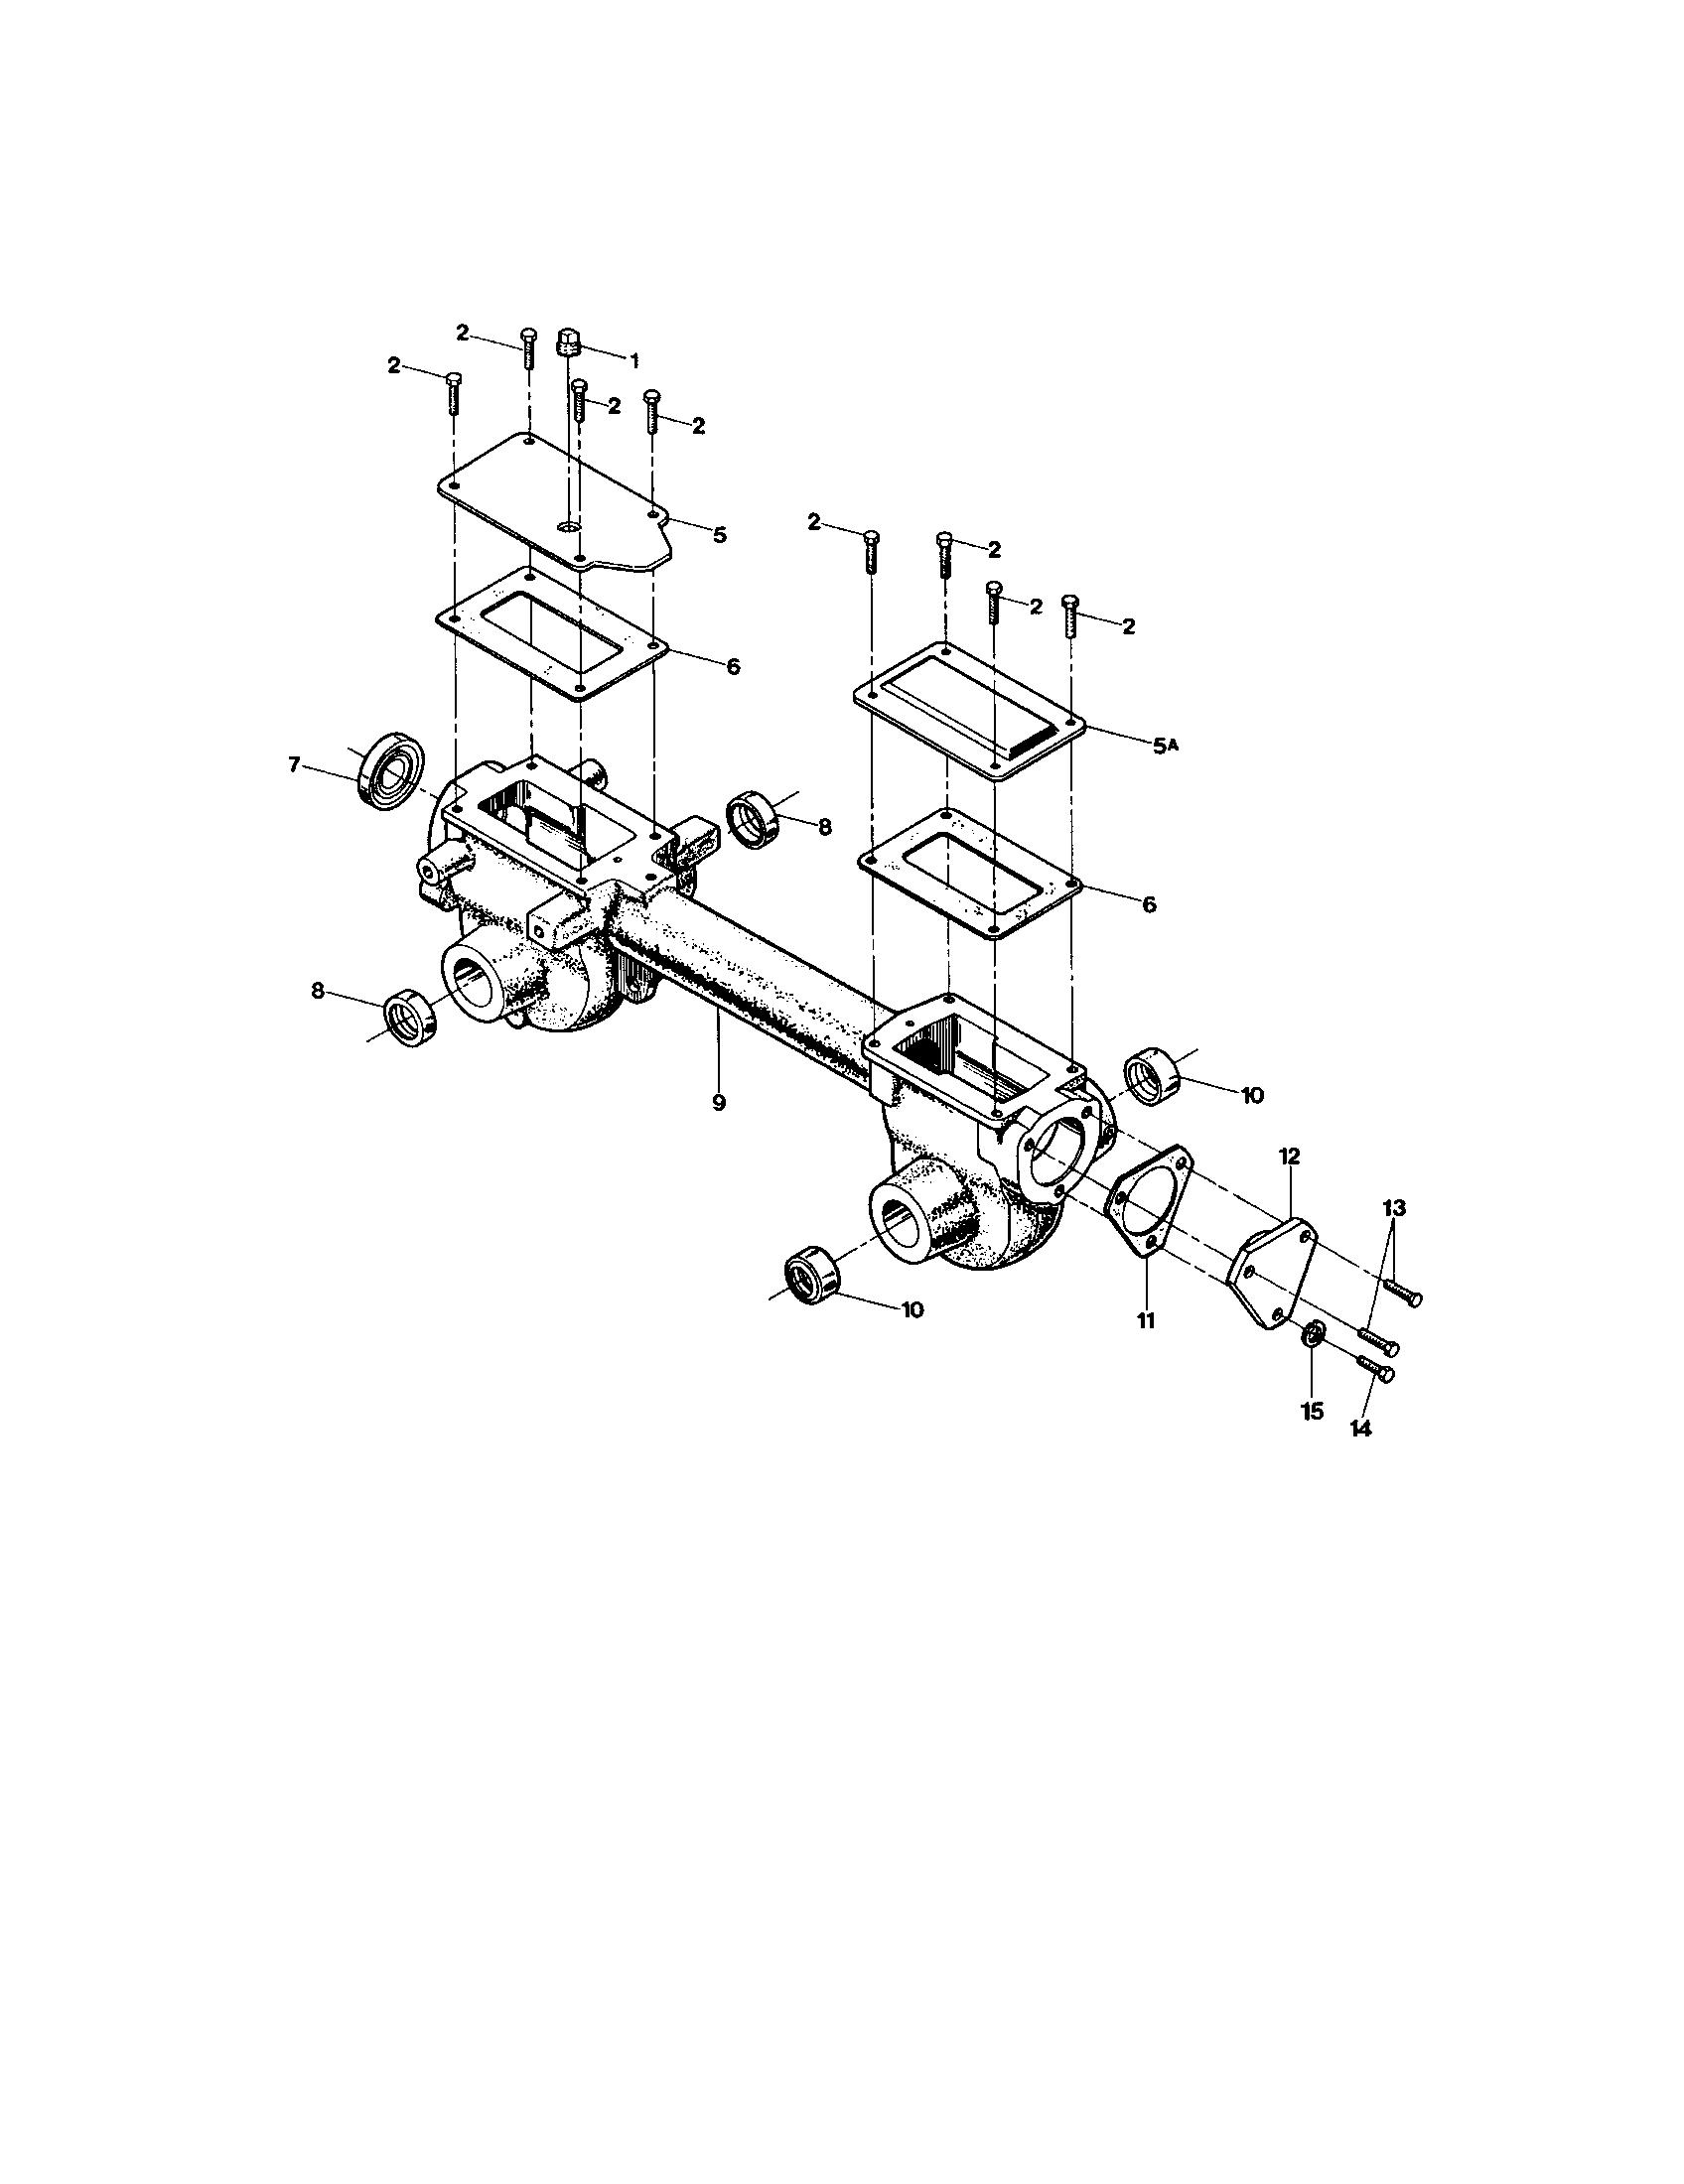 Troybilt model 12210 rear tine, gas tiller genuine parts